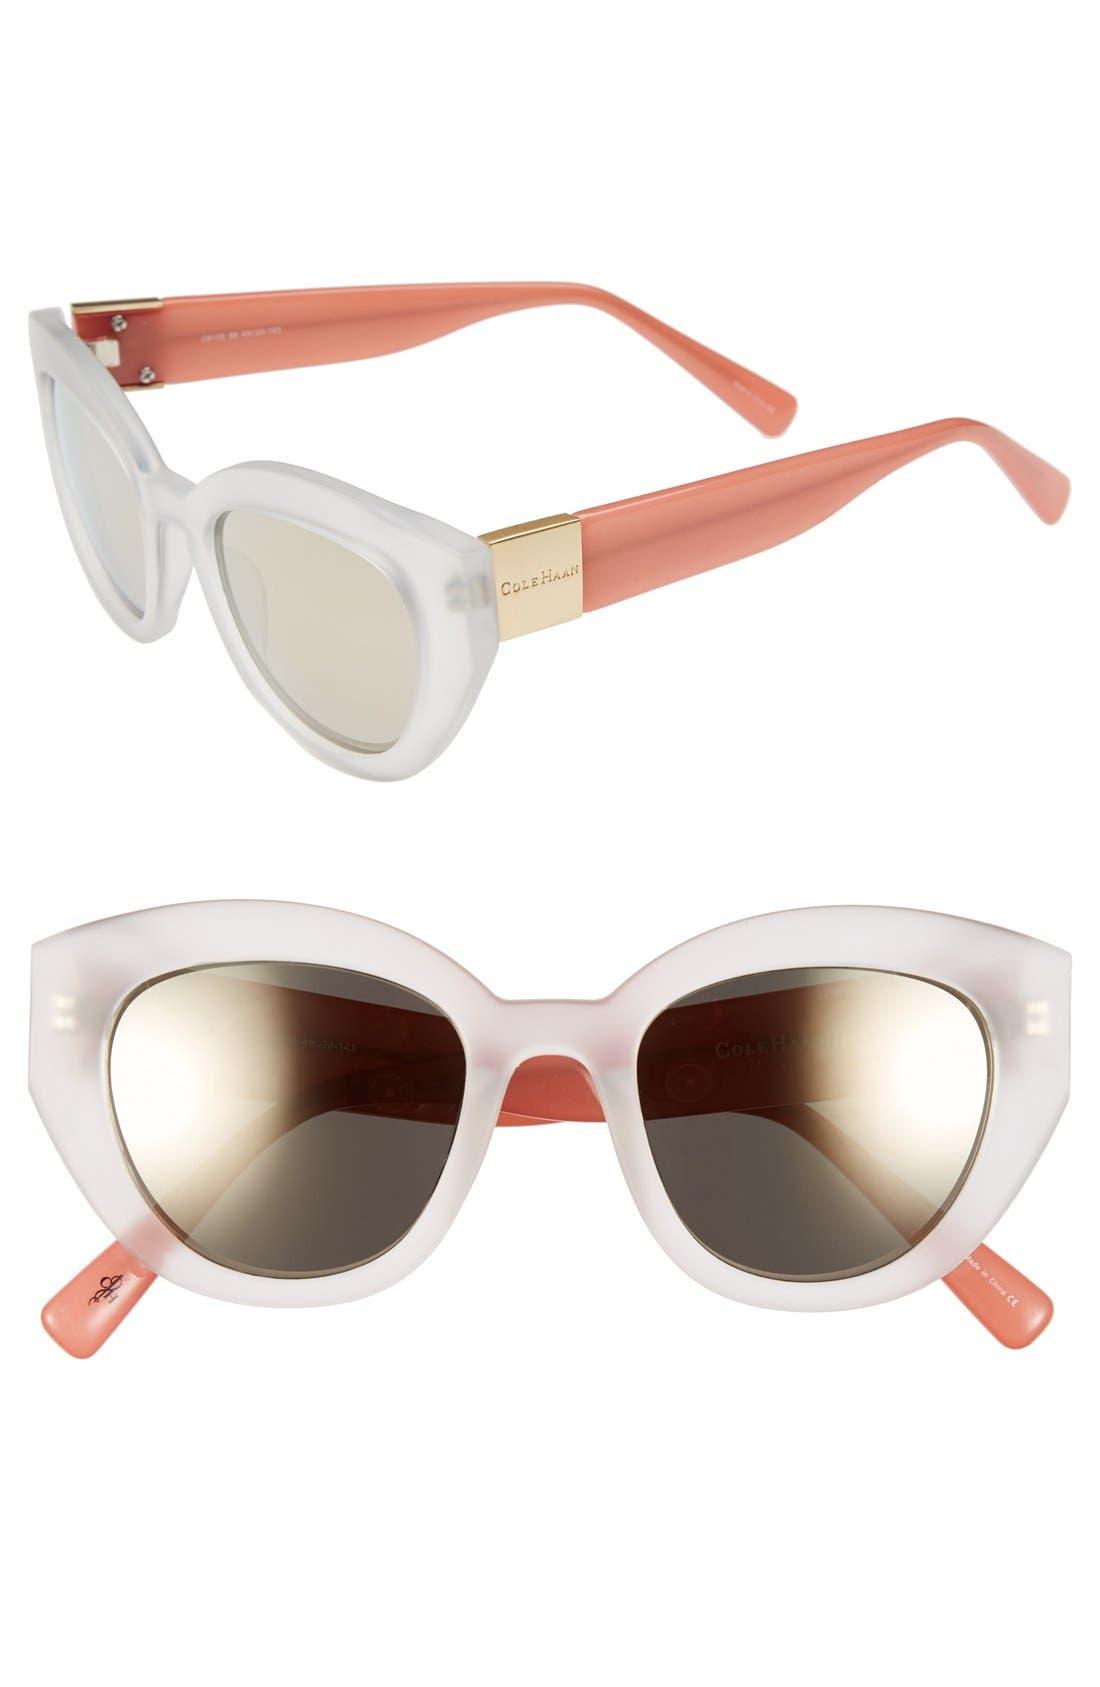 Main Image - Cole Haan 49mm Geometric Sunglasses